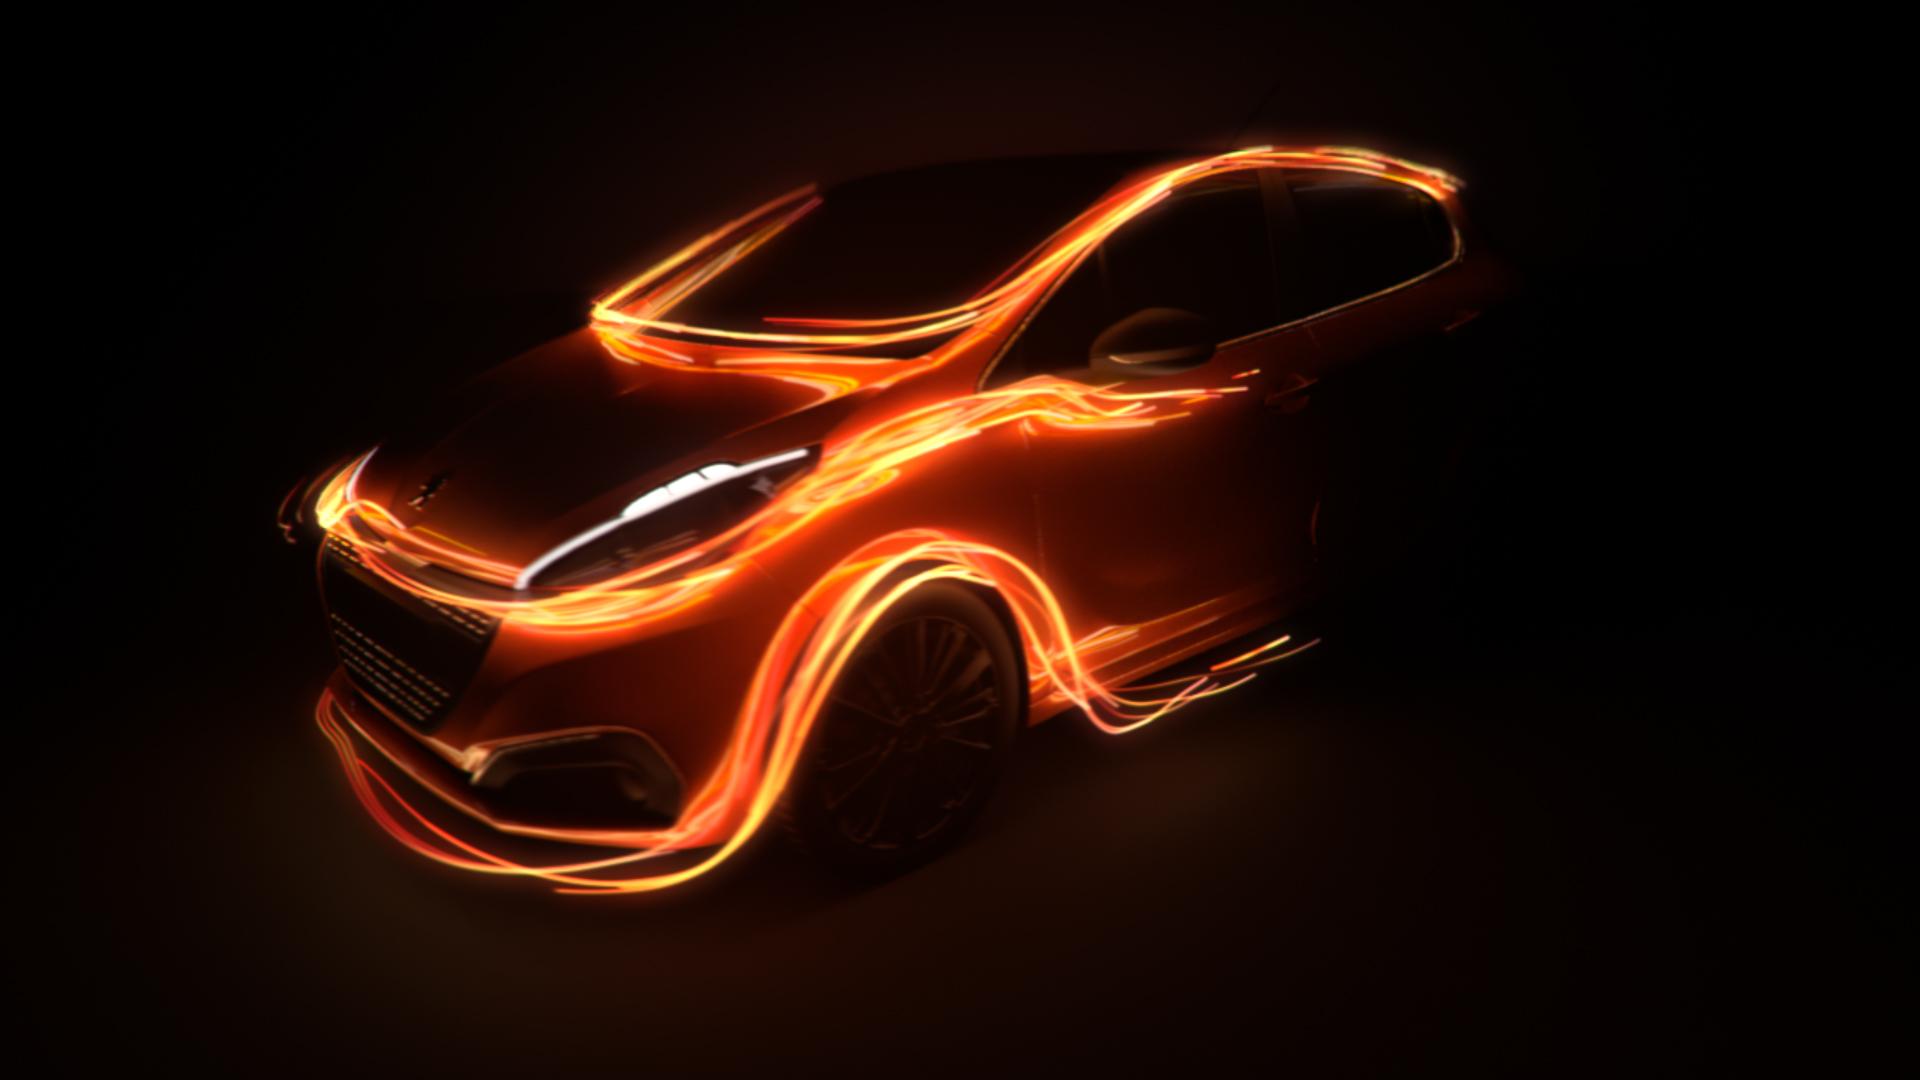 3D luminous particles trails on top of a Peugeot 208